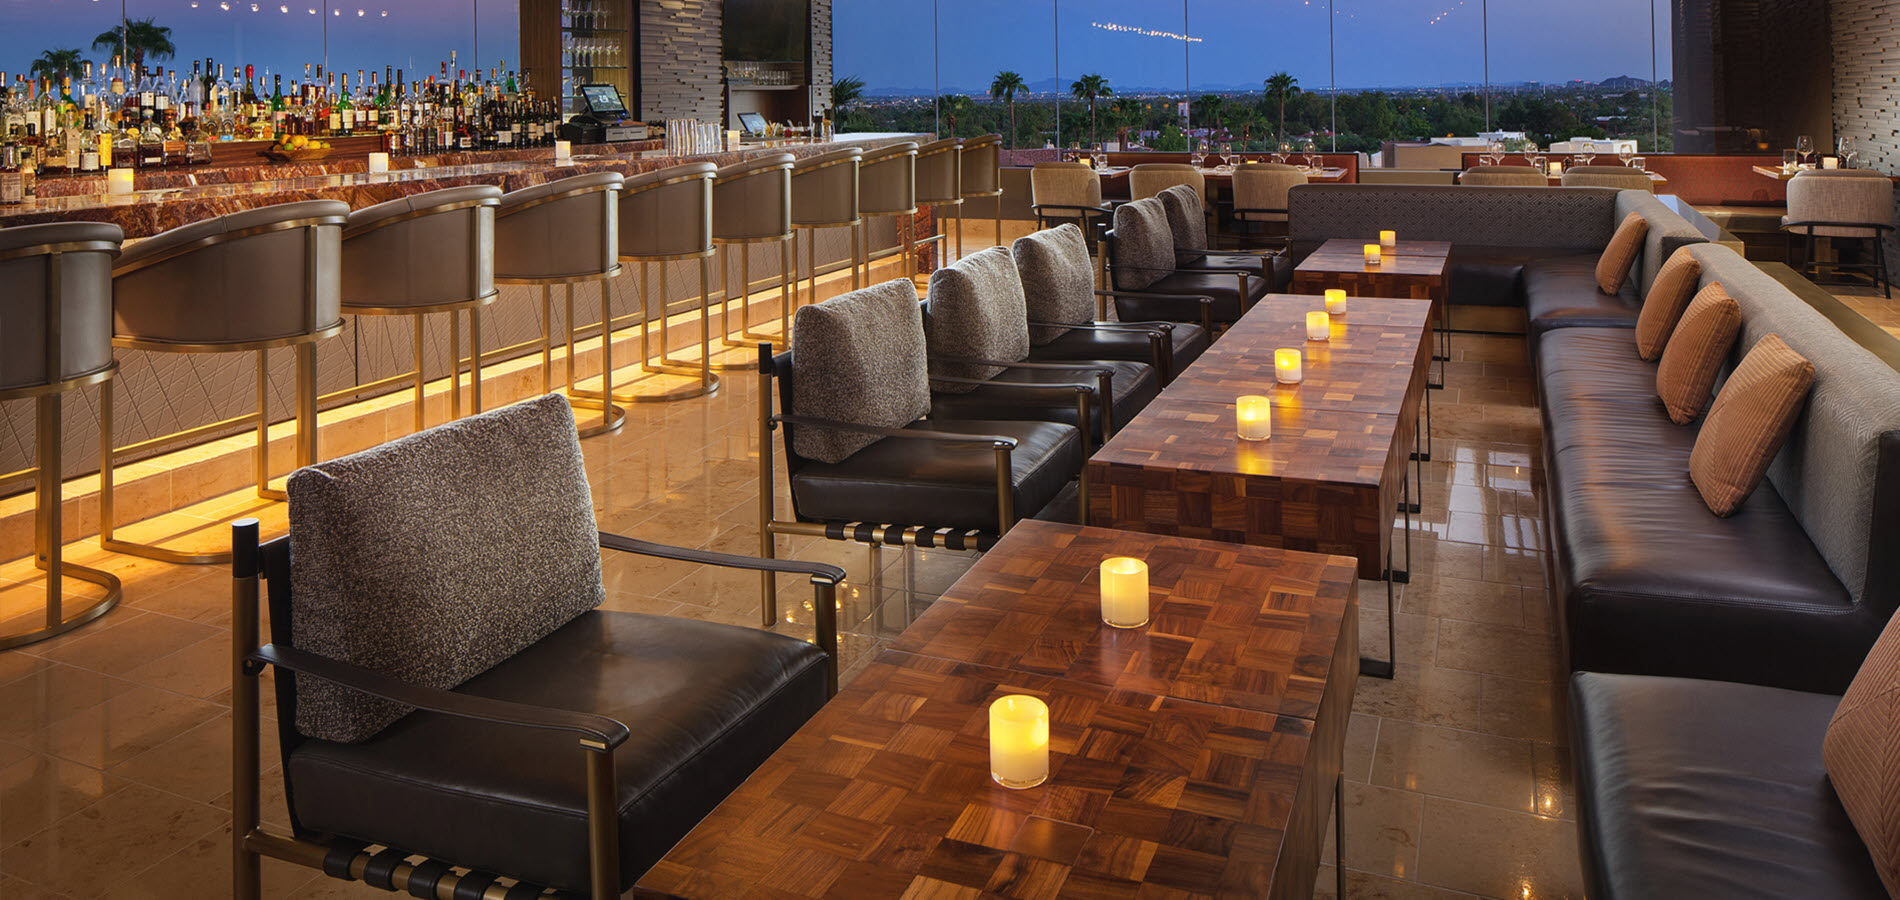 YSK Furniture project custom restaurant furniture interior dining furniture-1